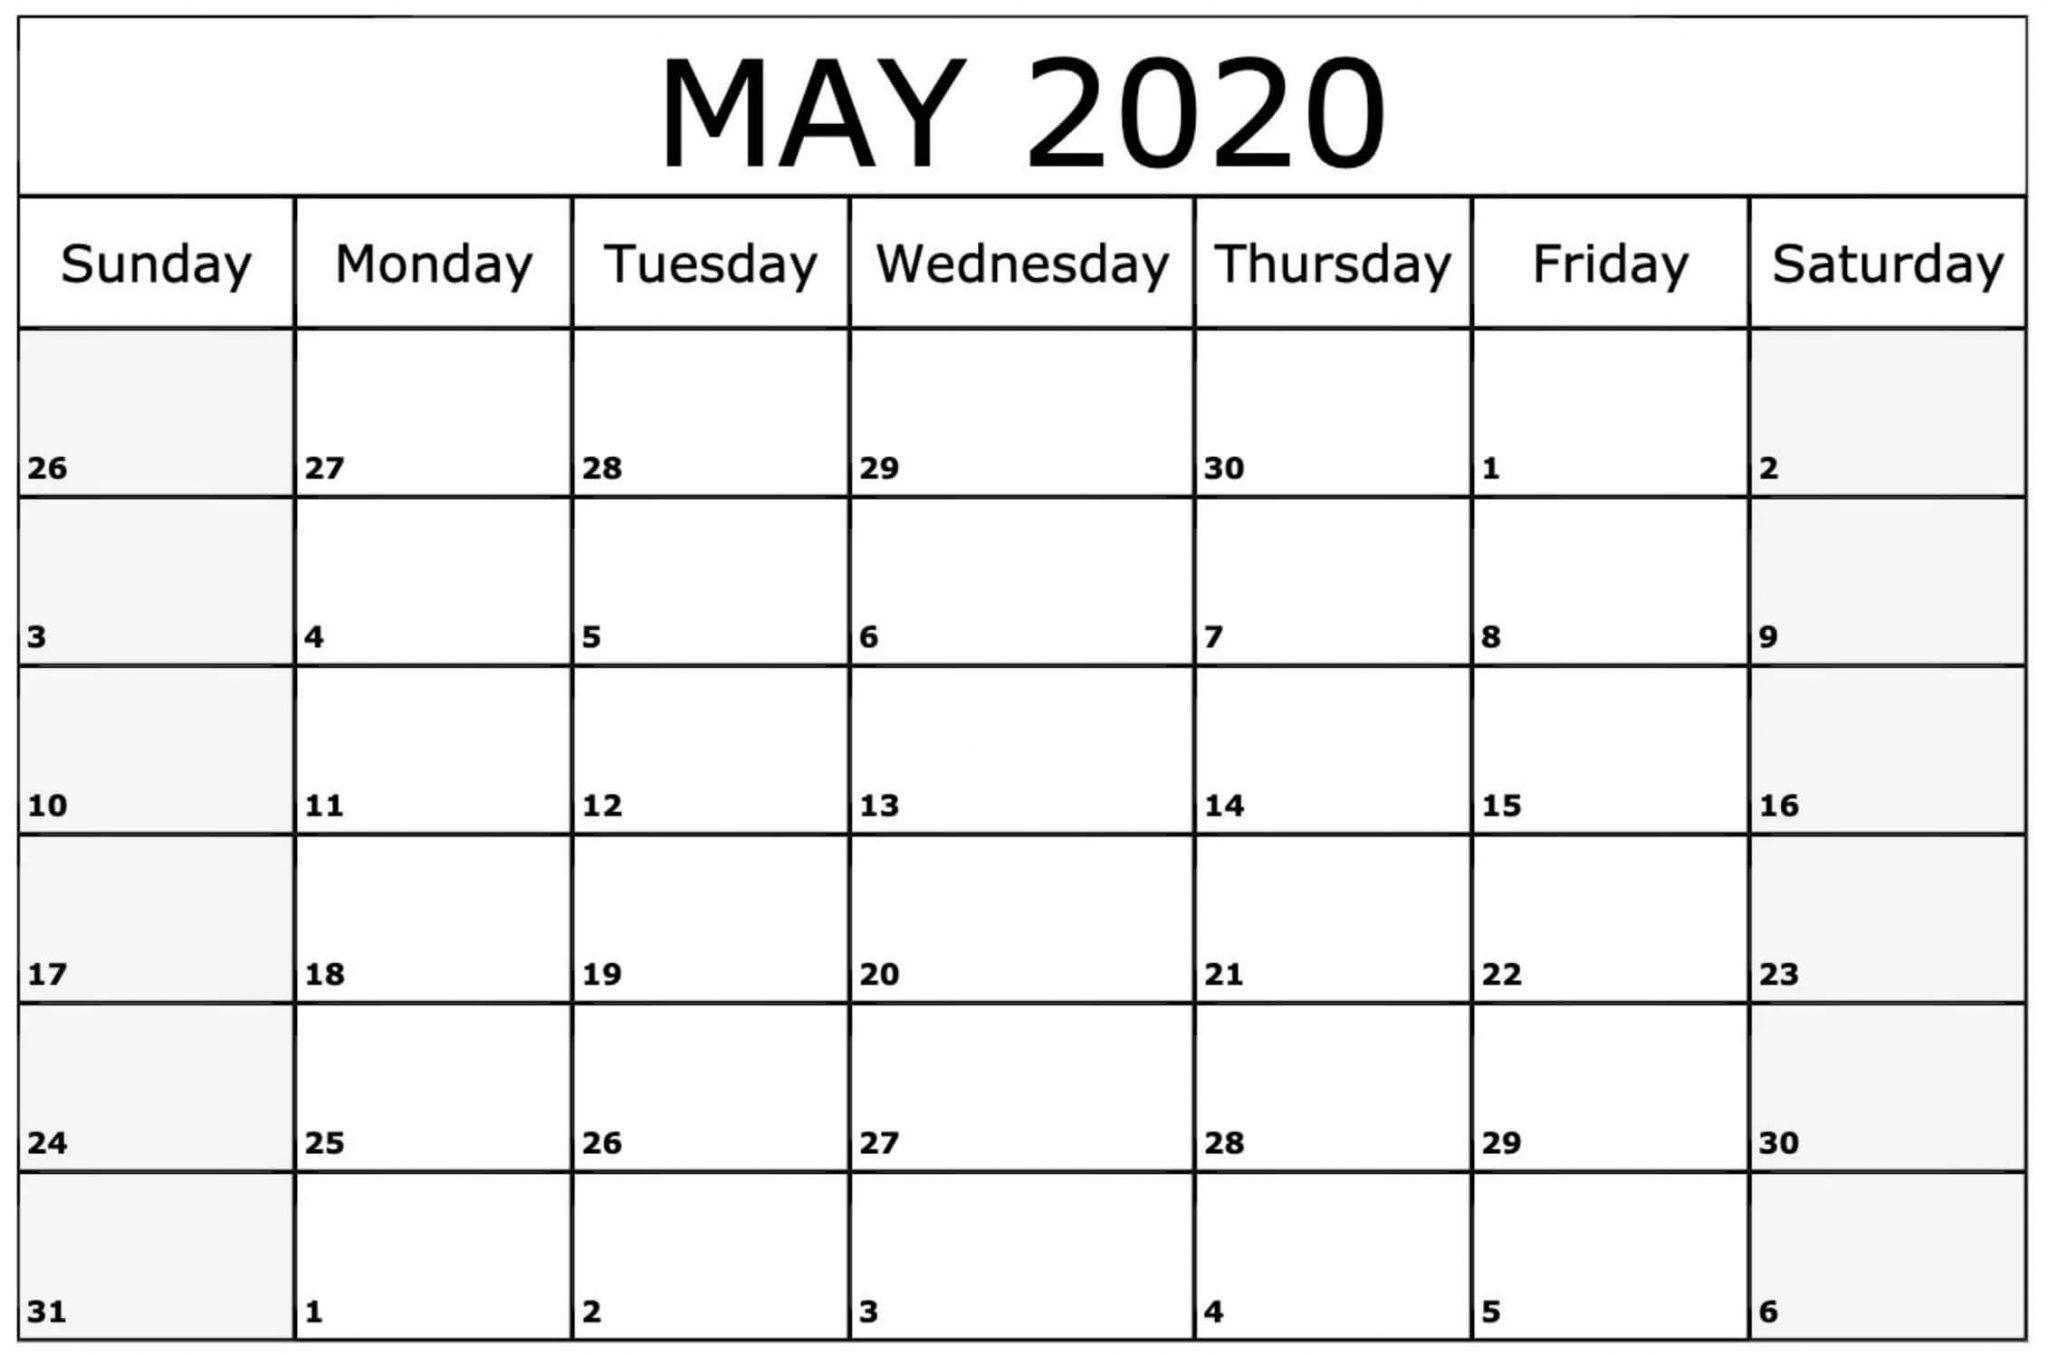 May 2020 Printable Calendar PDF